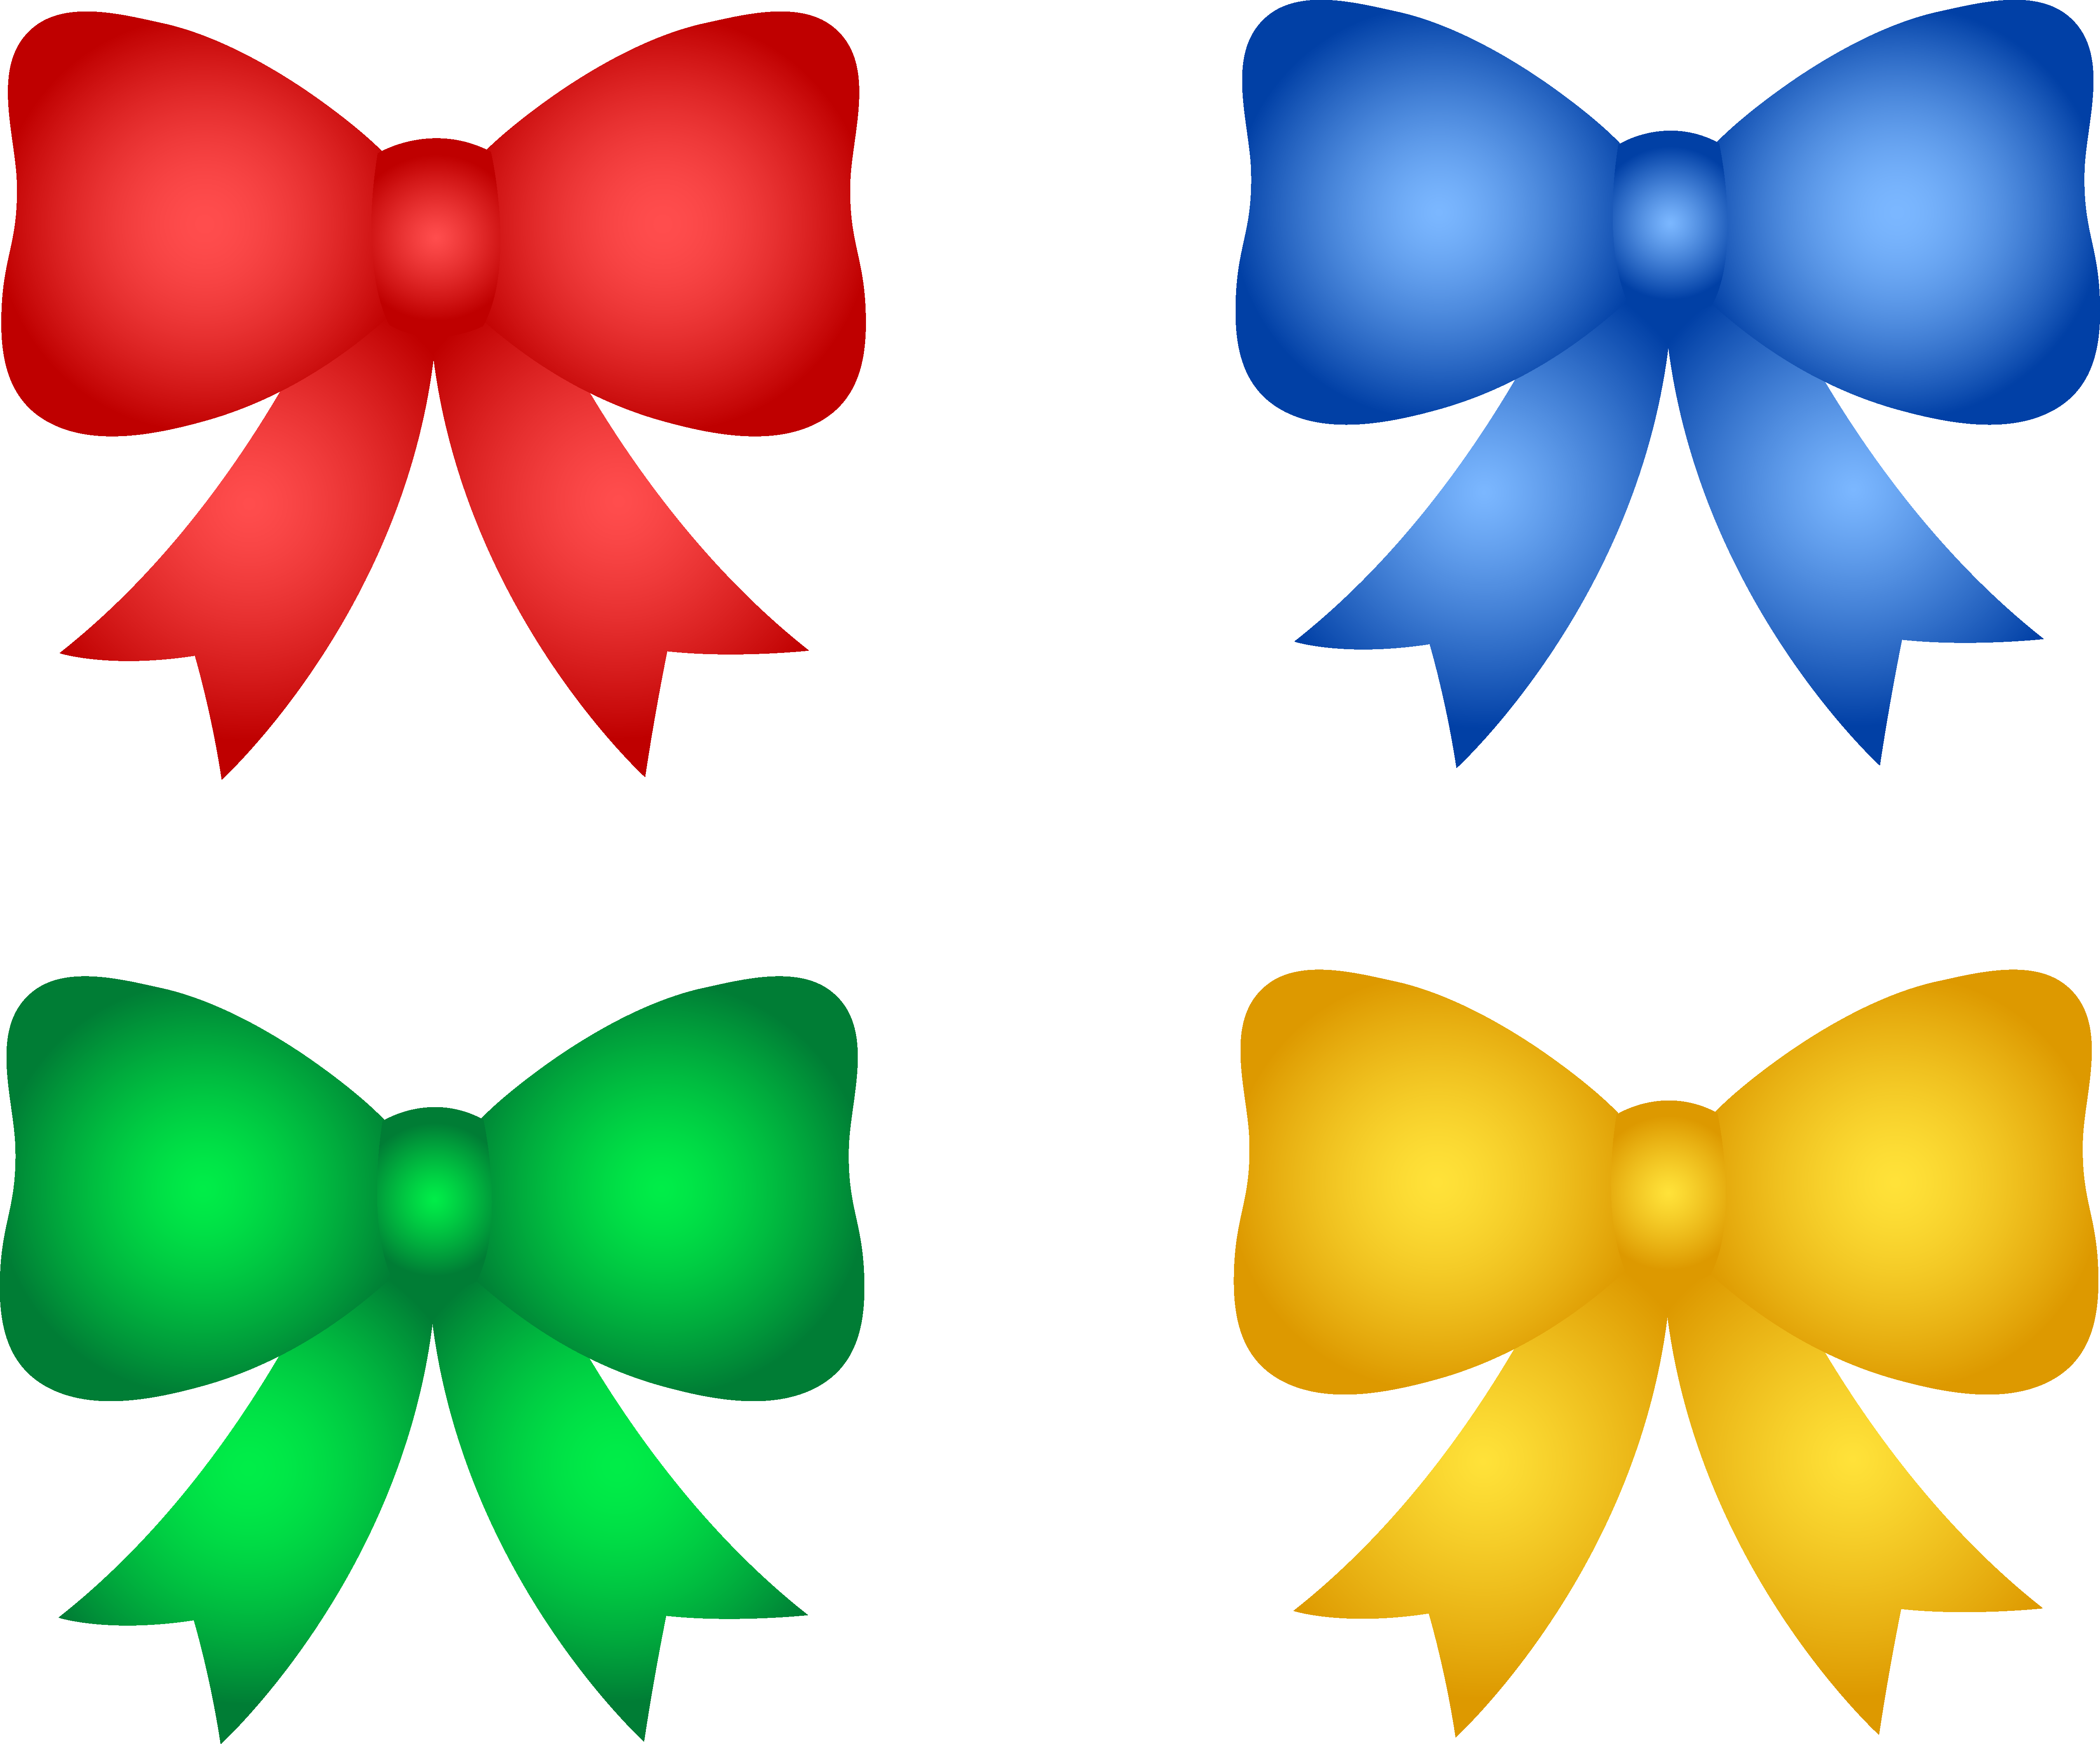 5095x4231 Birthday Christmas Ribbon Clip Art Merry Christmas Amp Happy New